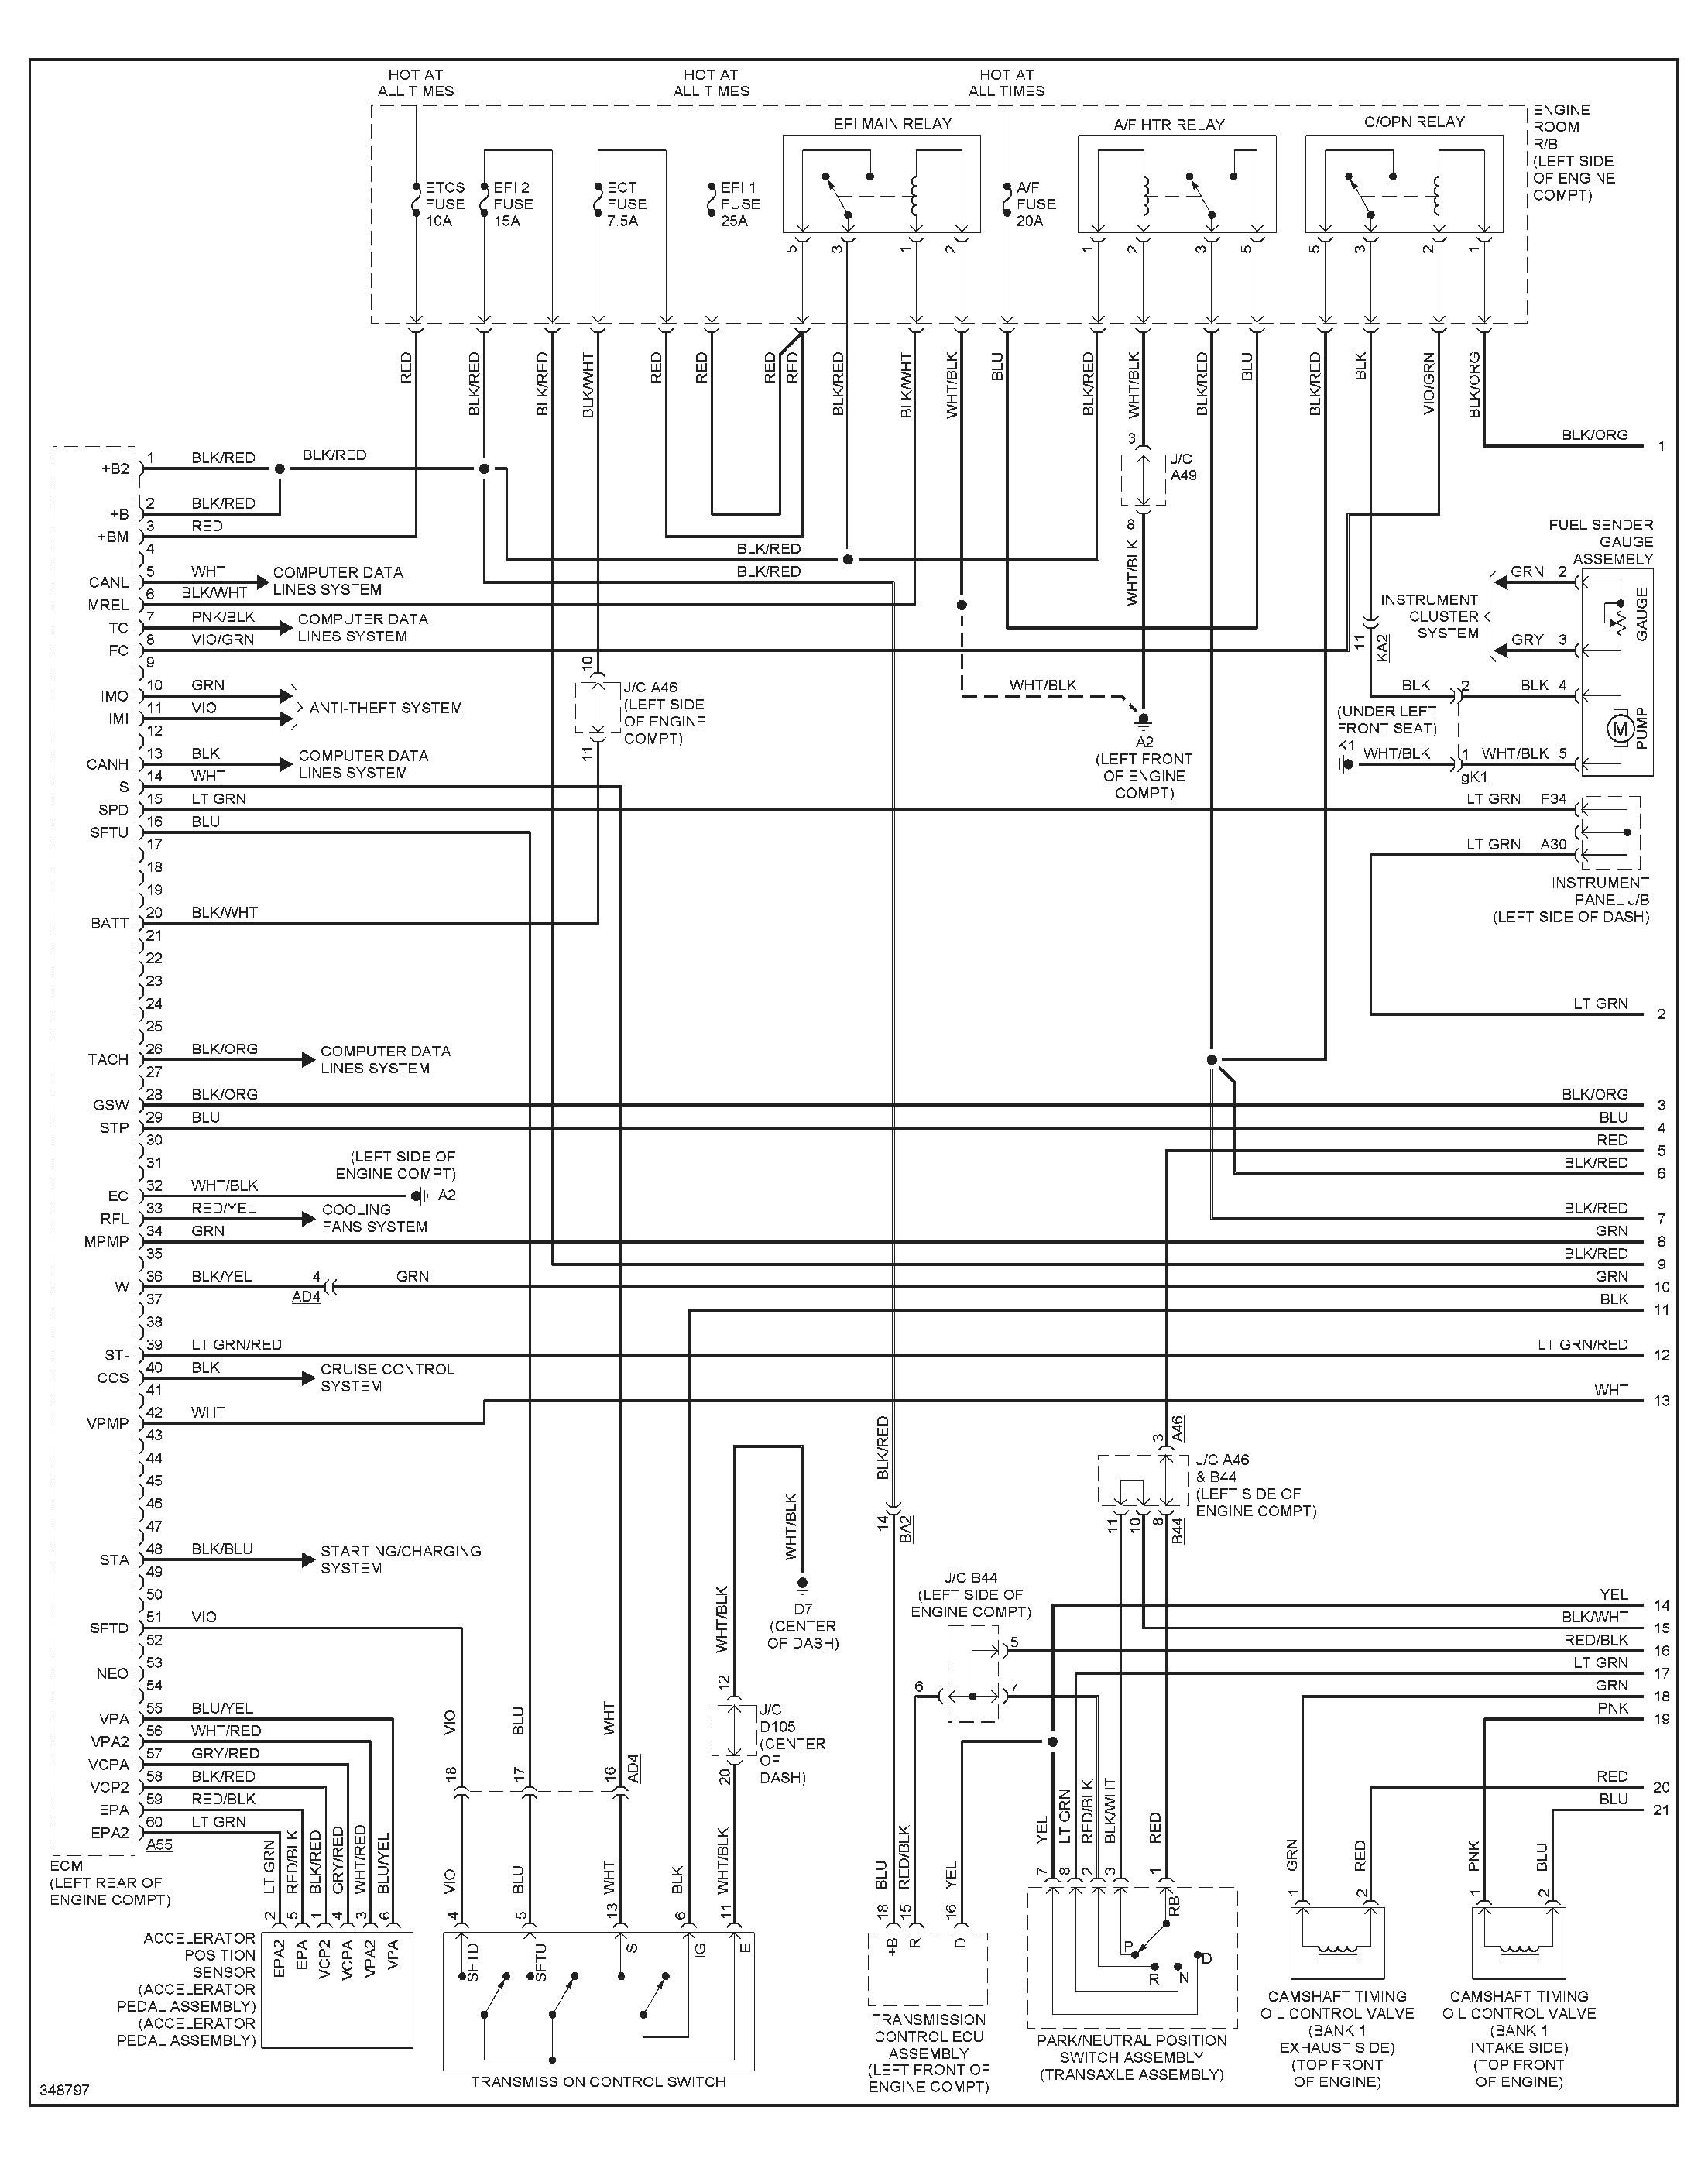 DIAGRAM] Viper 4103 Wiring Diagram FULL Version HD Quality Wiring Diagram -  STRUCTUREDWIREENCLOSURE.RAPFRANCE.FRstructuredwireenclosure.rapfrance.fr